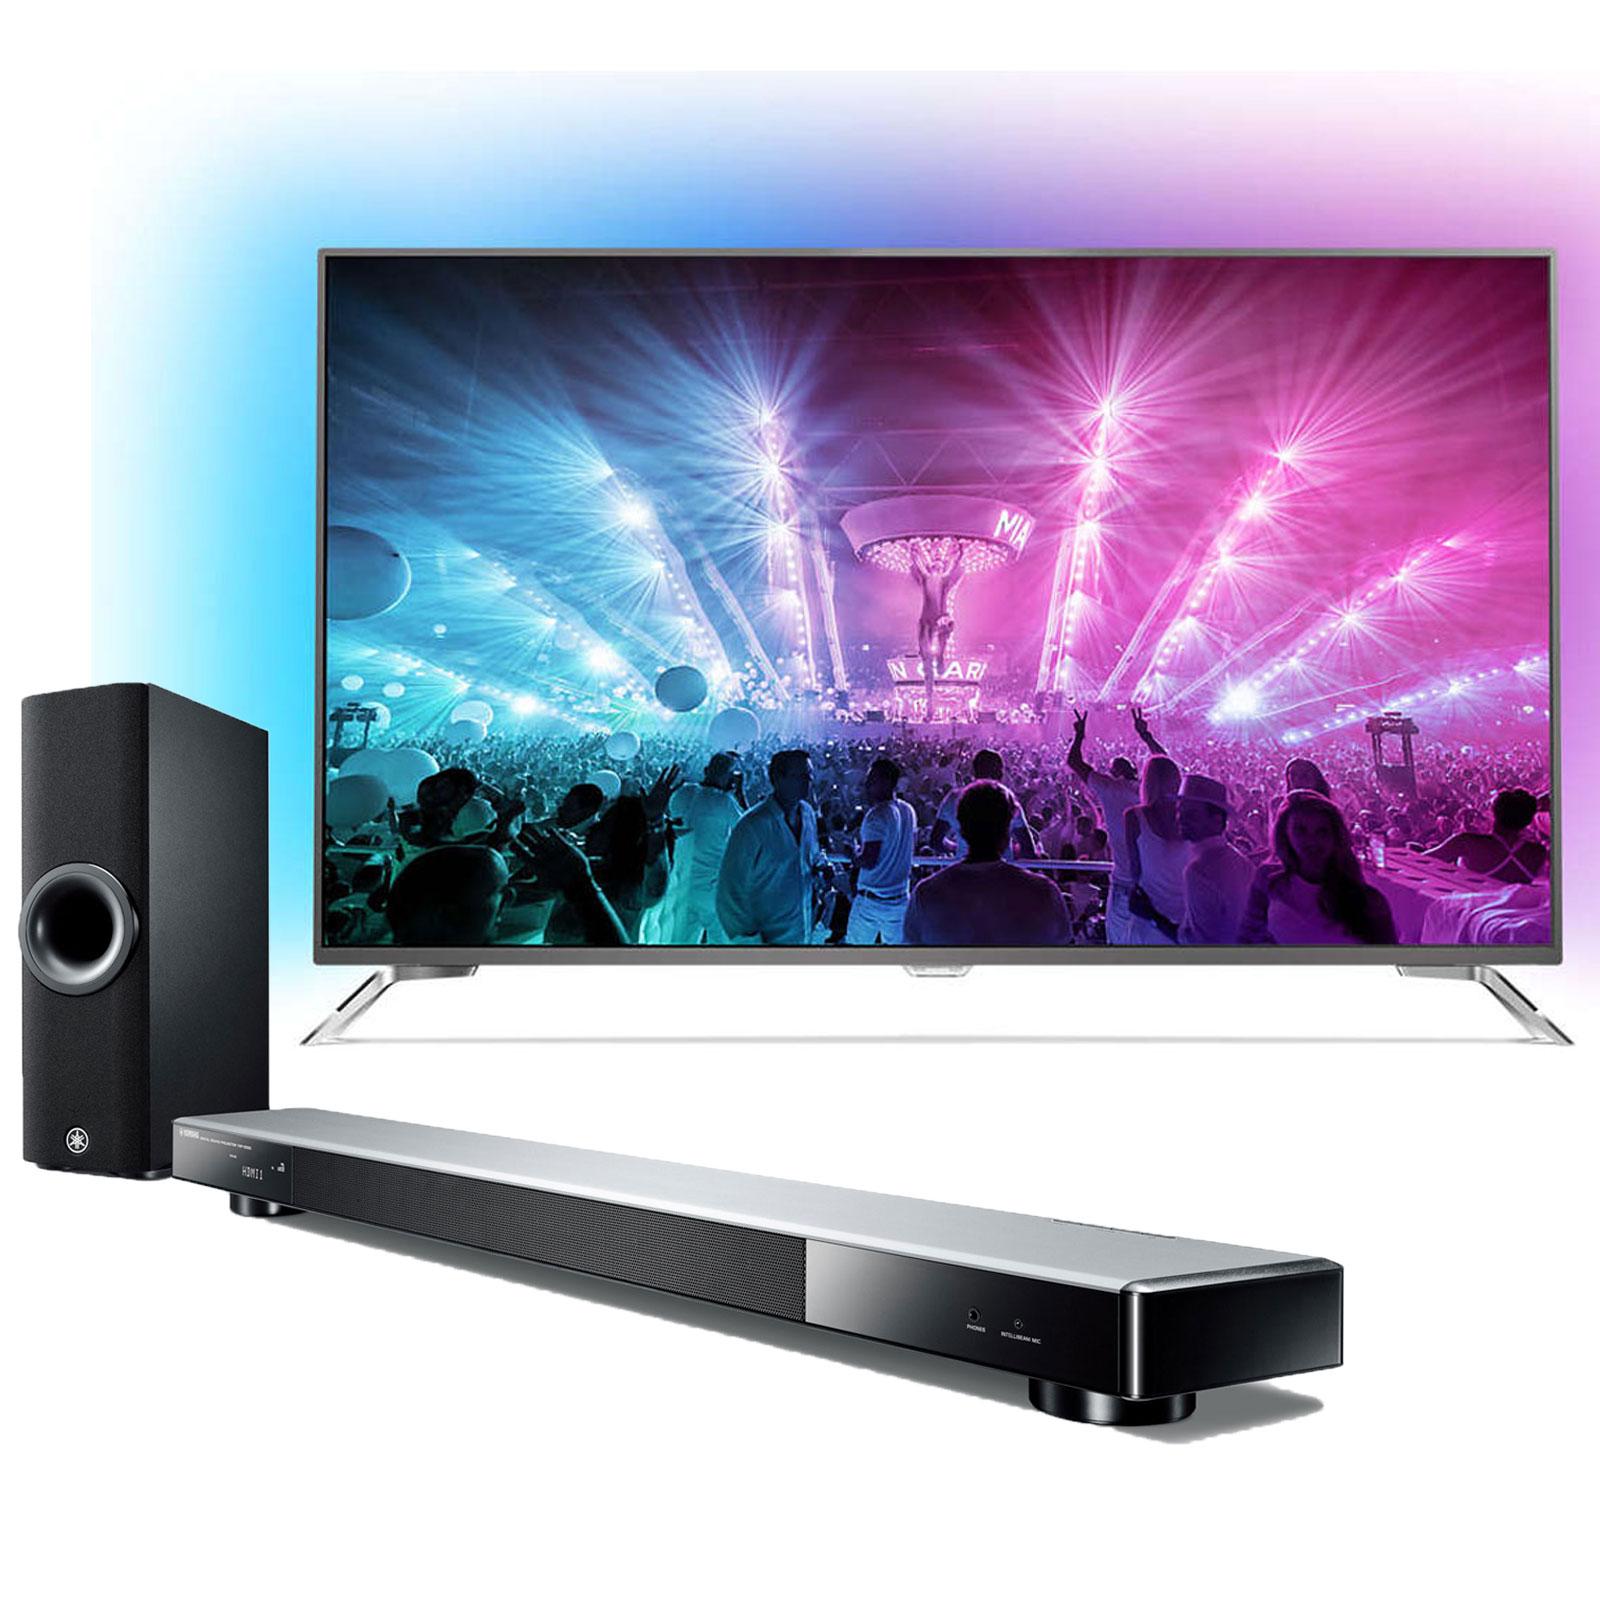 philips 65pus7101 yamaha ysp 2500 titane tv philips. Black Bedroom Furniture Sets. Home Design Ideas